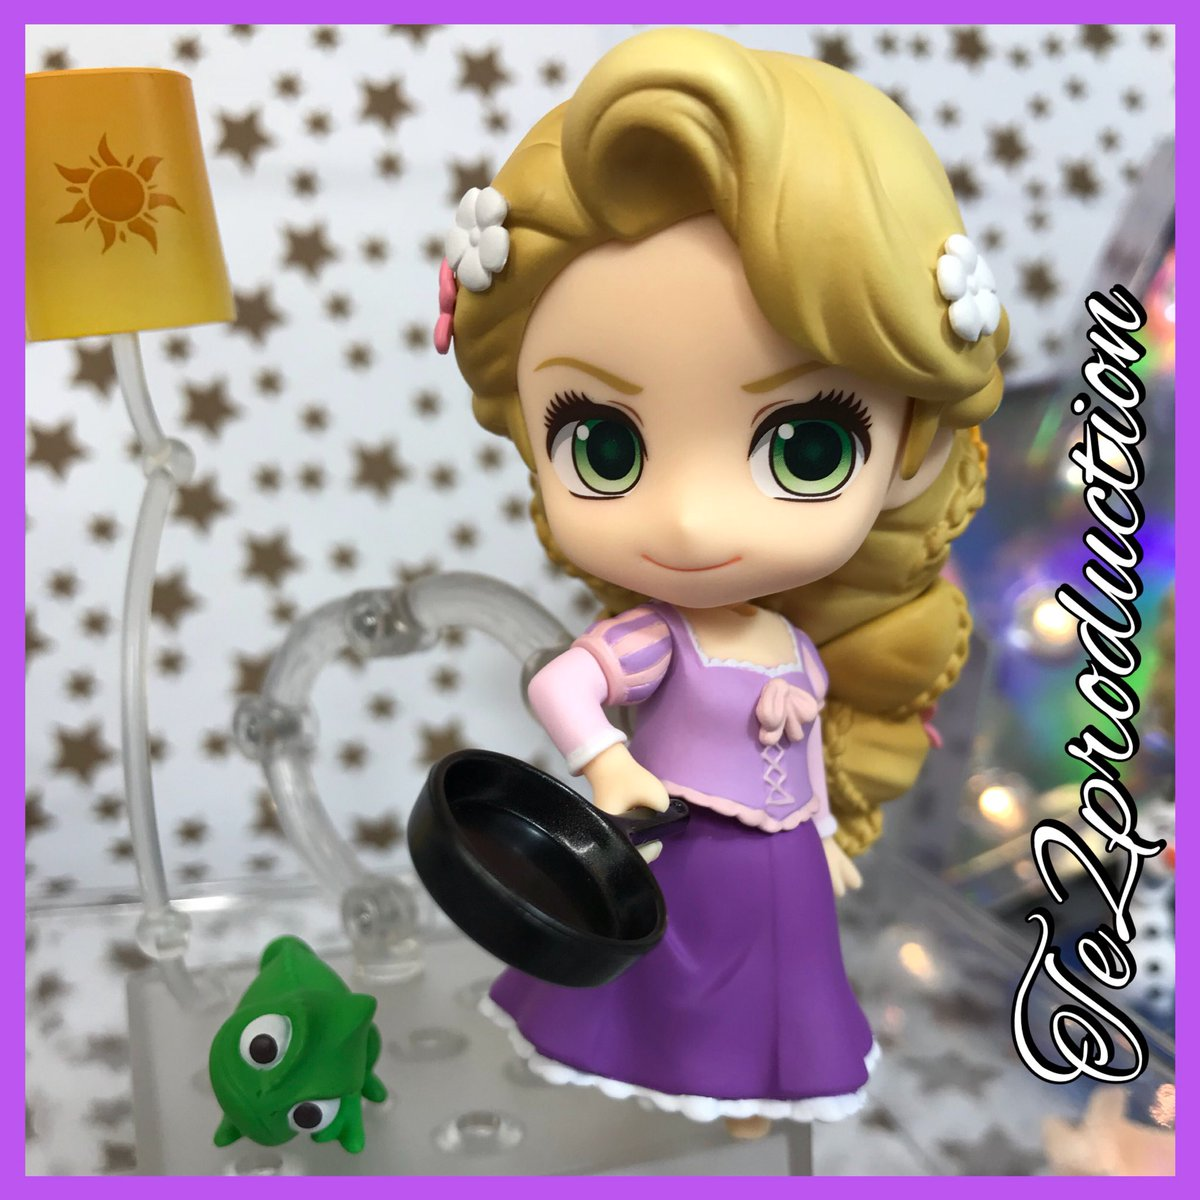 Erikku On Twitter Https Tco B229qwcnd2 Disney Tangled Figure Rapunzel 618 Am 4 Feb 2018